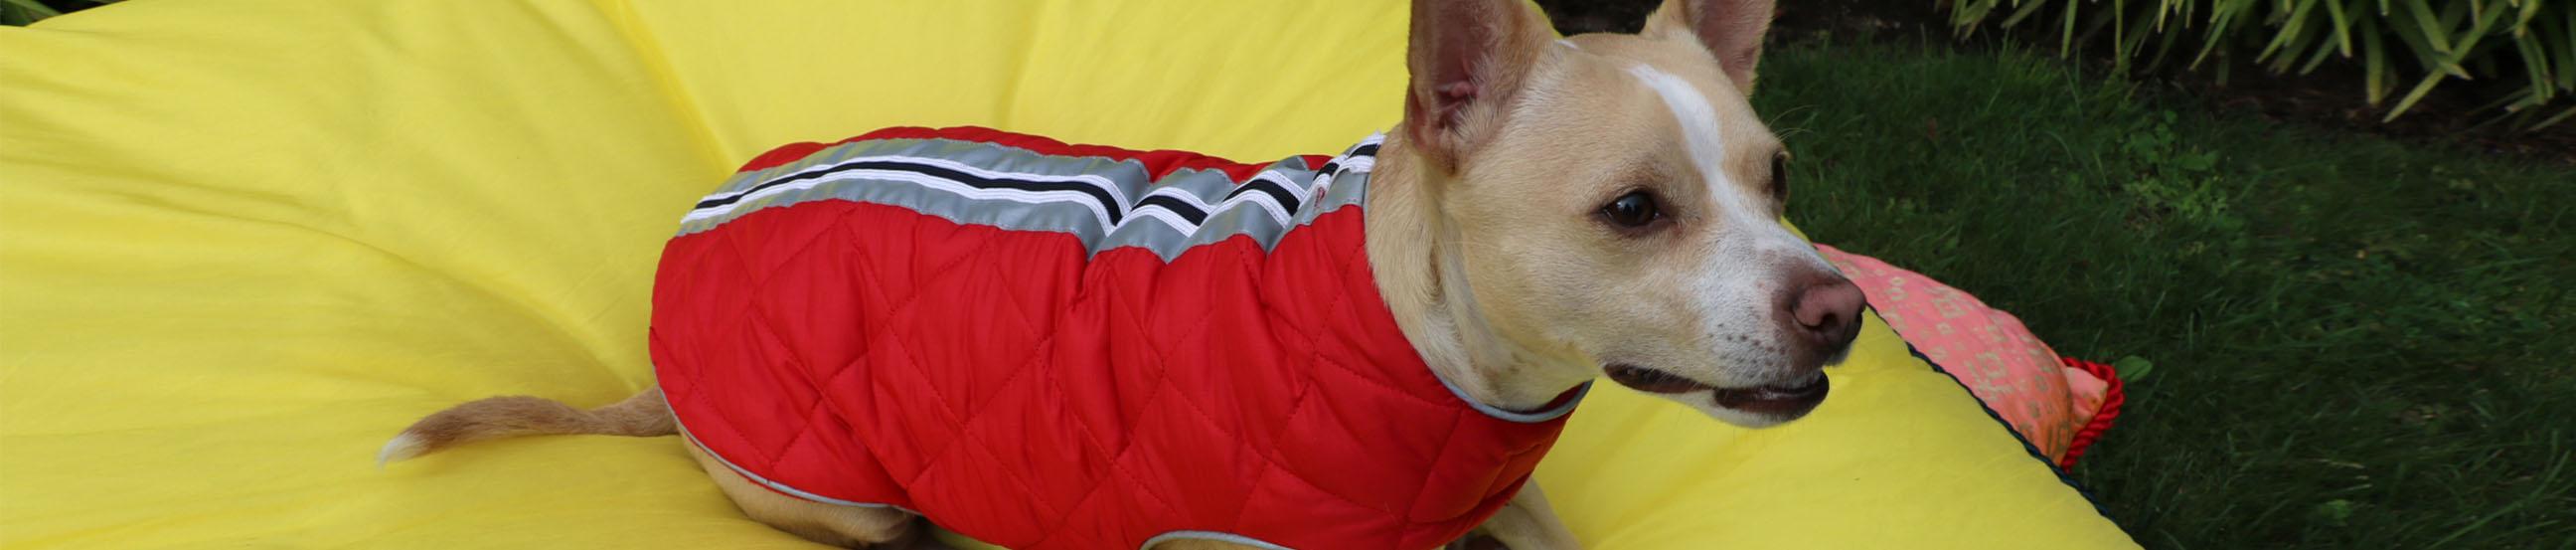 Top Selling Fleece Dog Sweaters